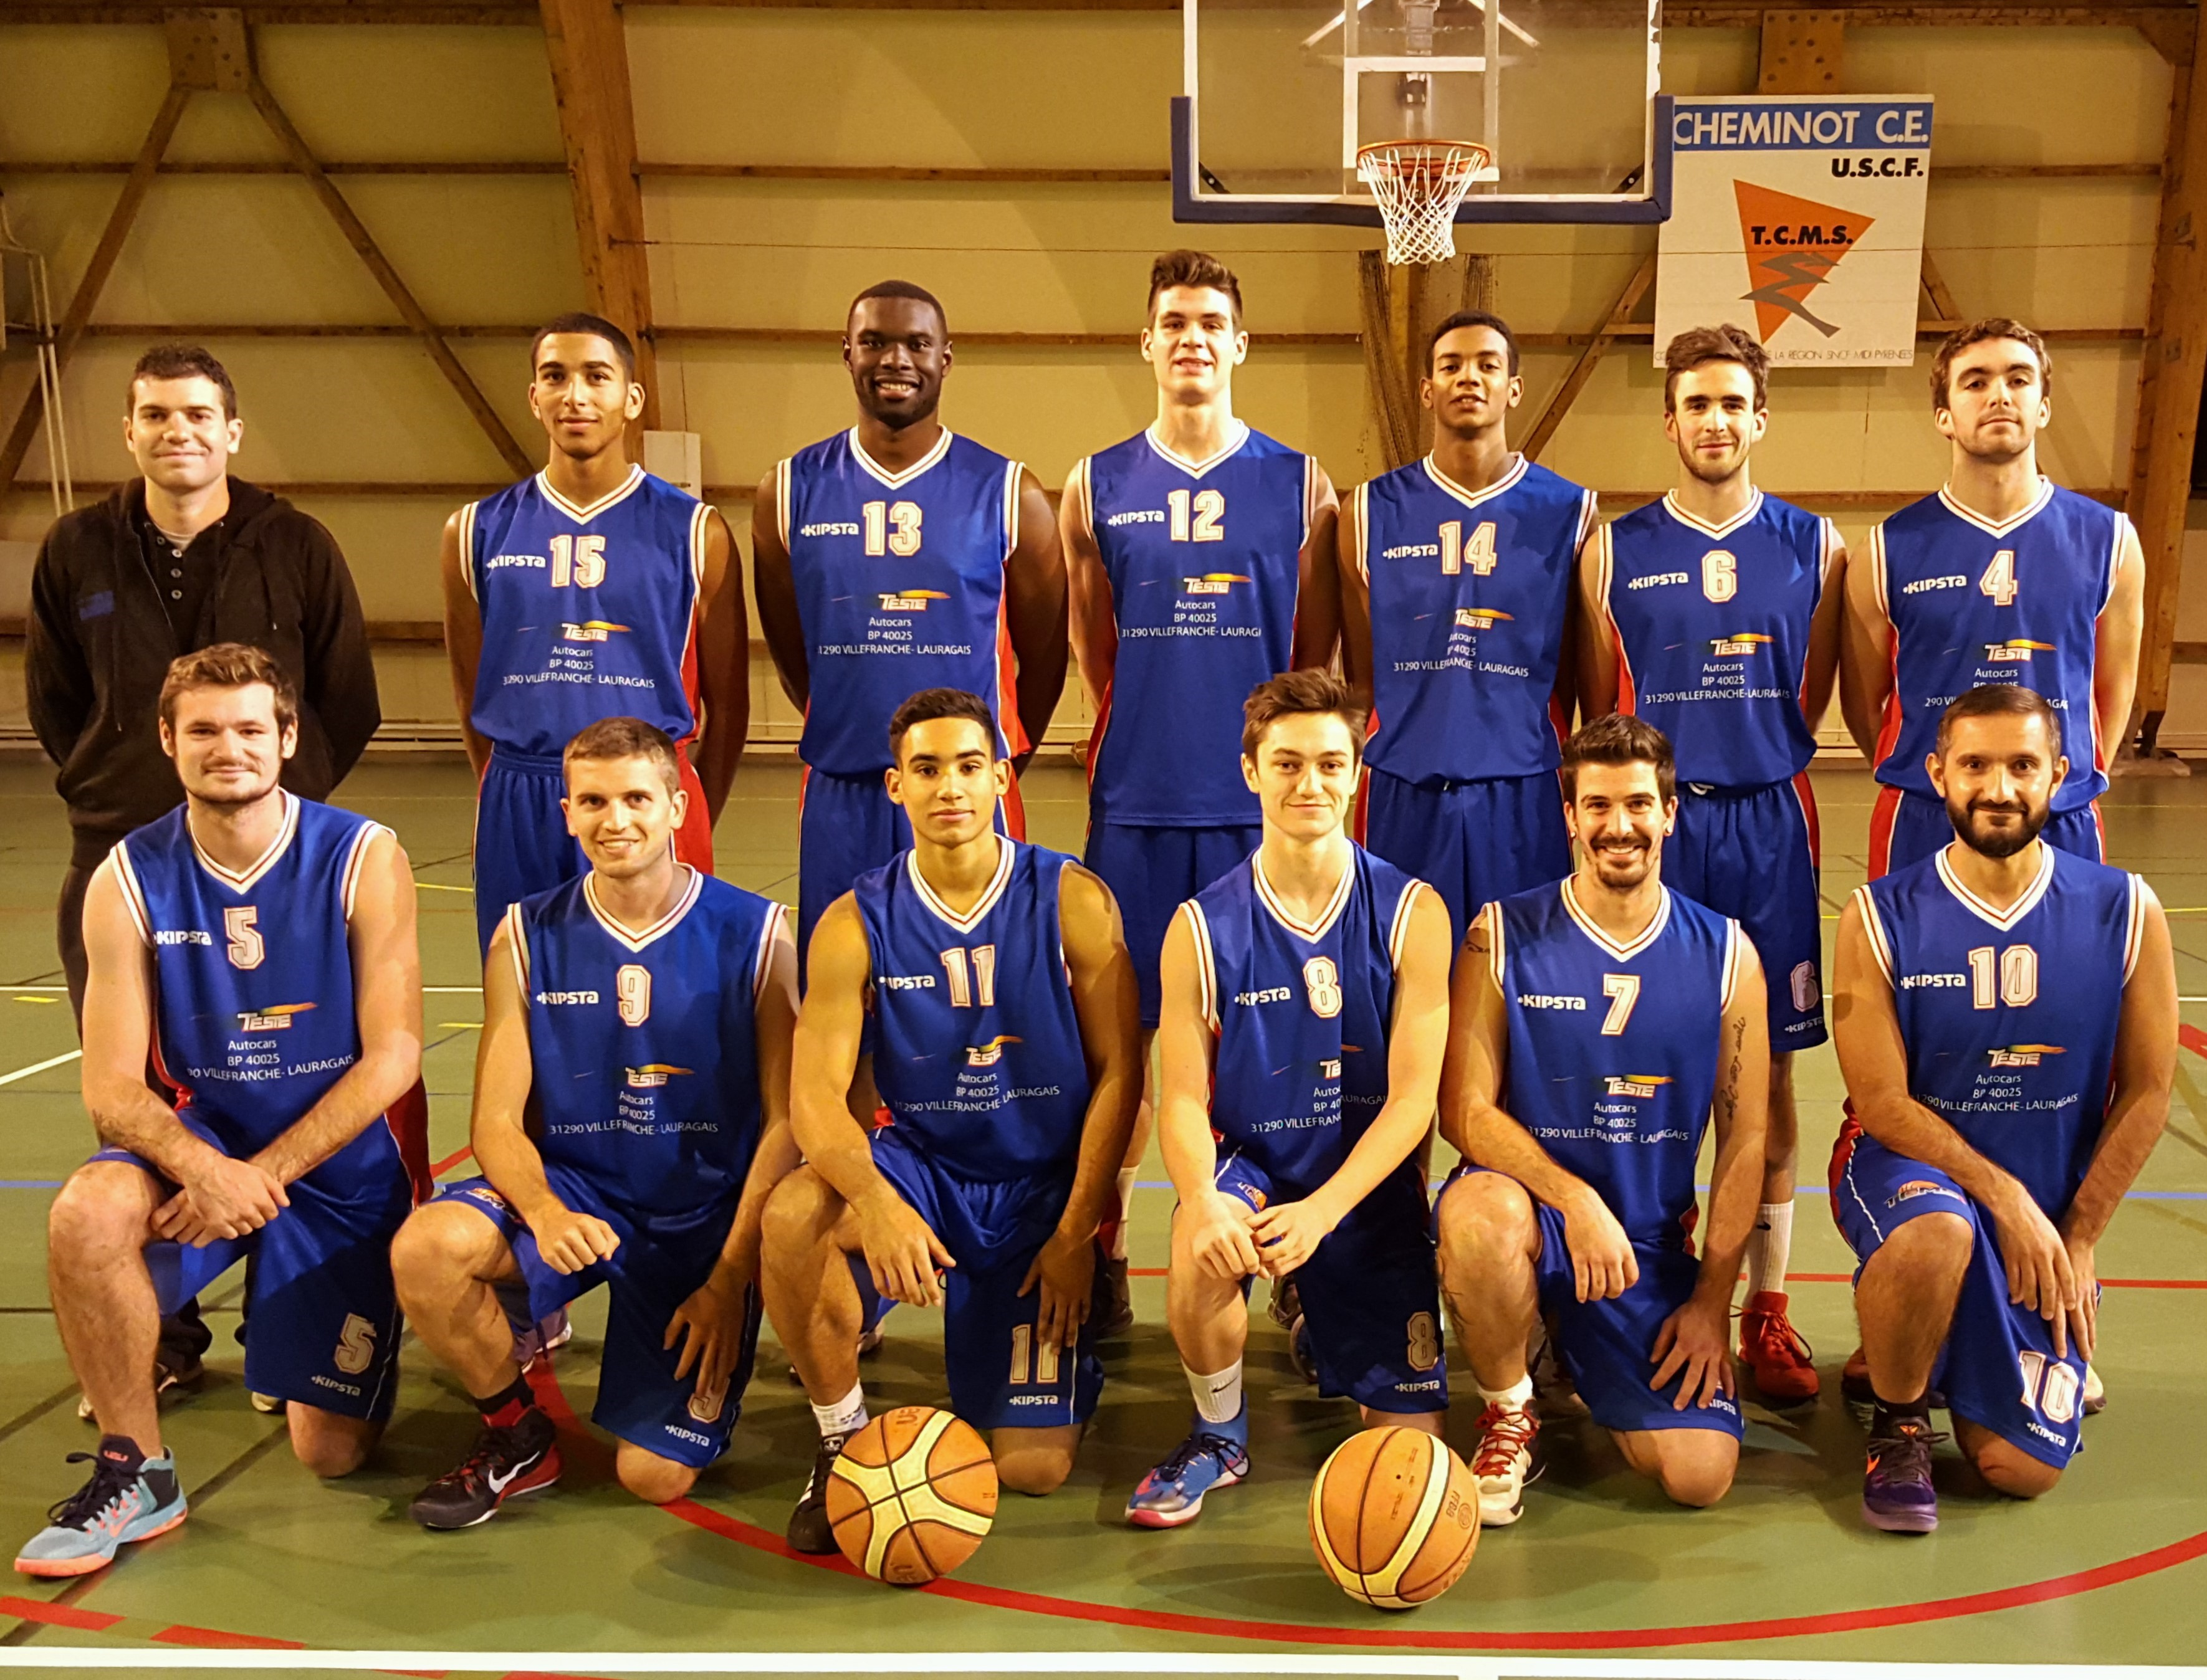 Photo d'équipe SG1 / Saison 2015-16